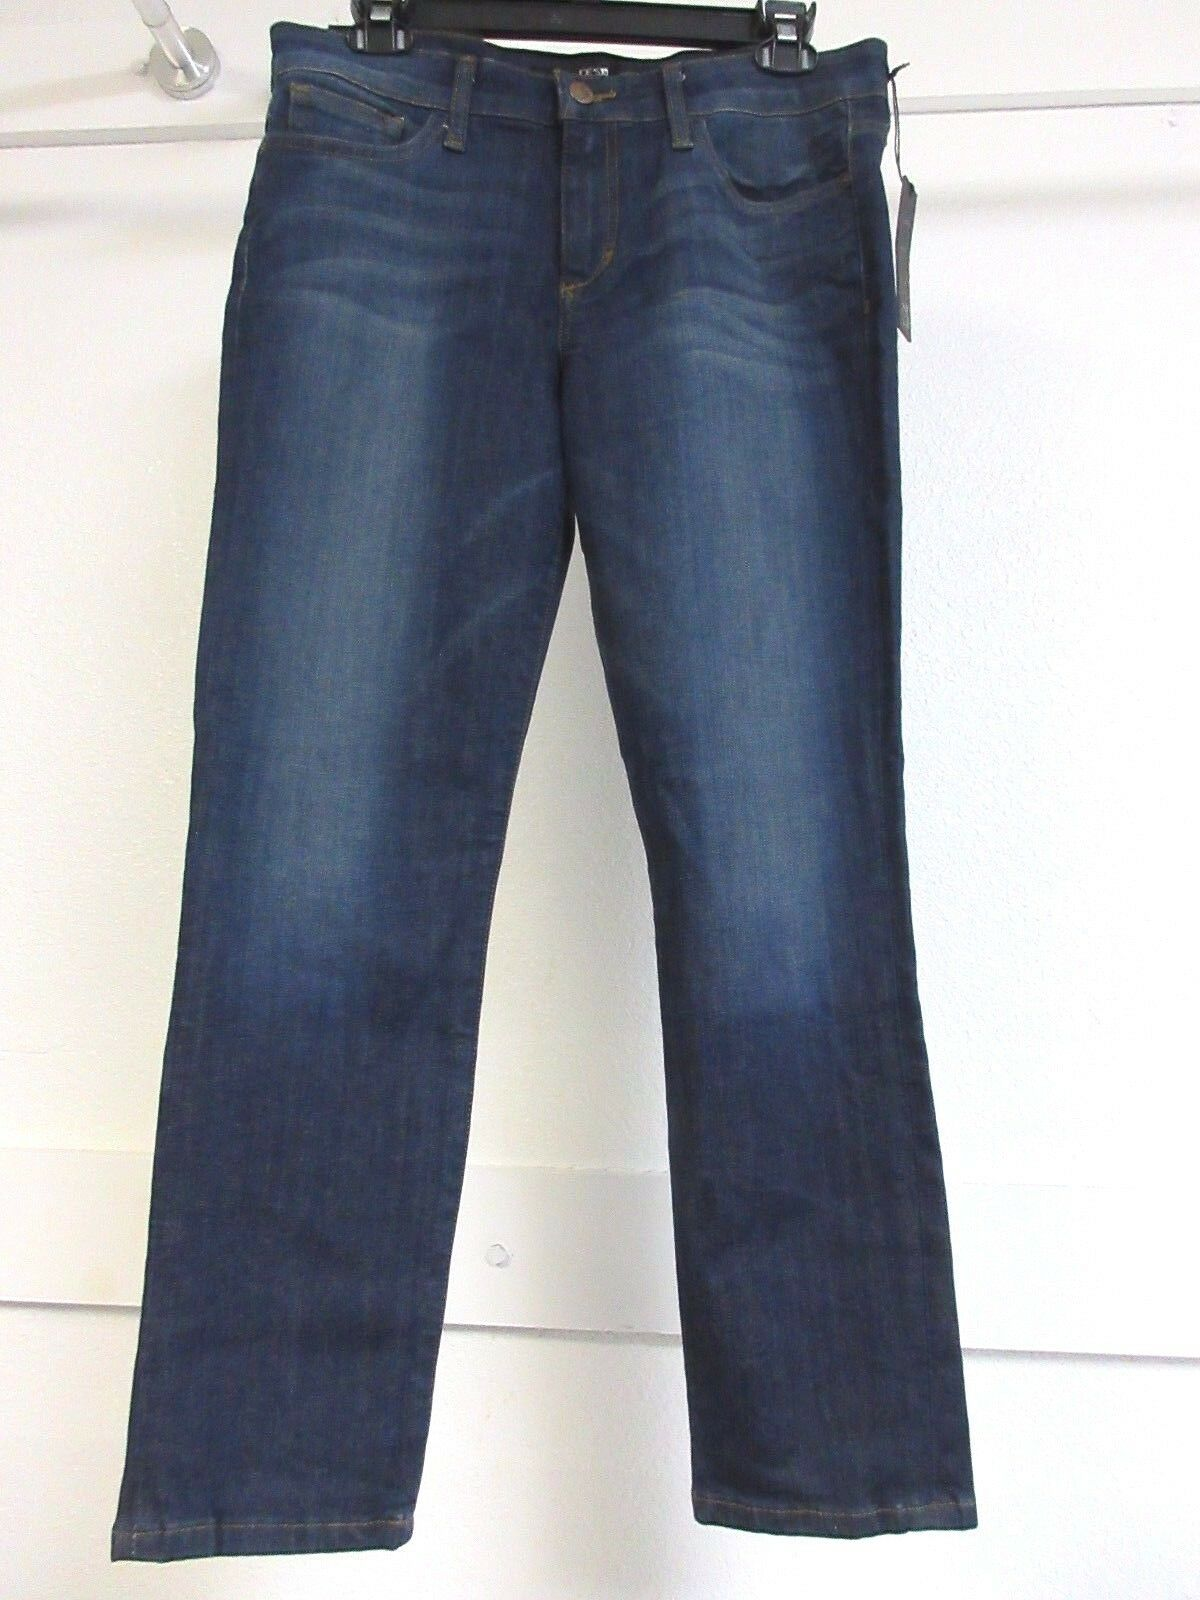 NEW Joe's The Skinny Jean Mid-Rise Premium Denim Jeans in Ceece bluee - 29